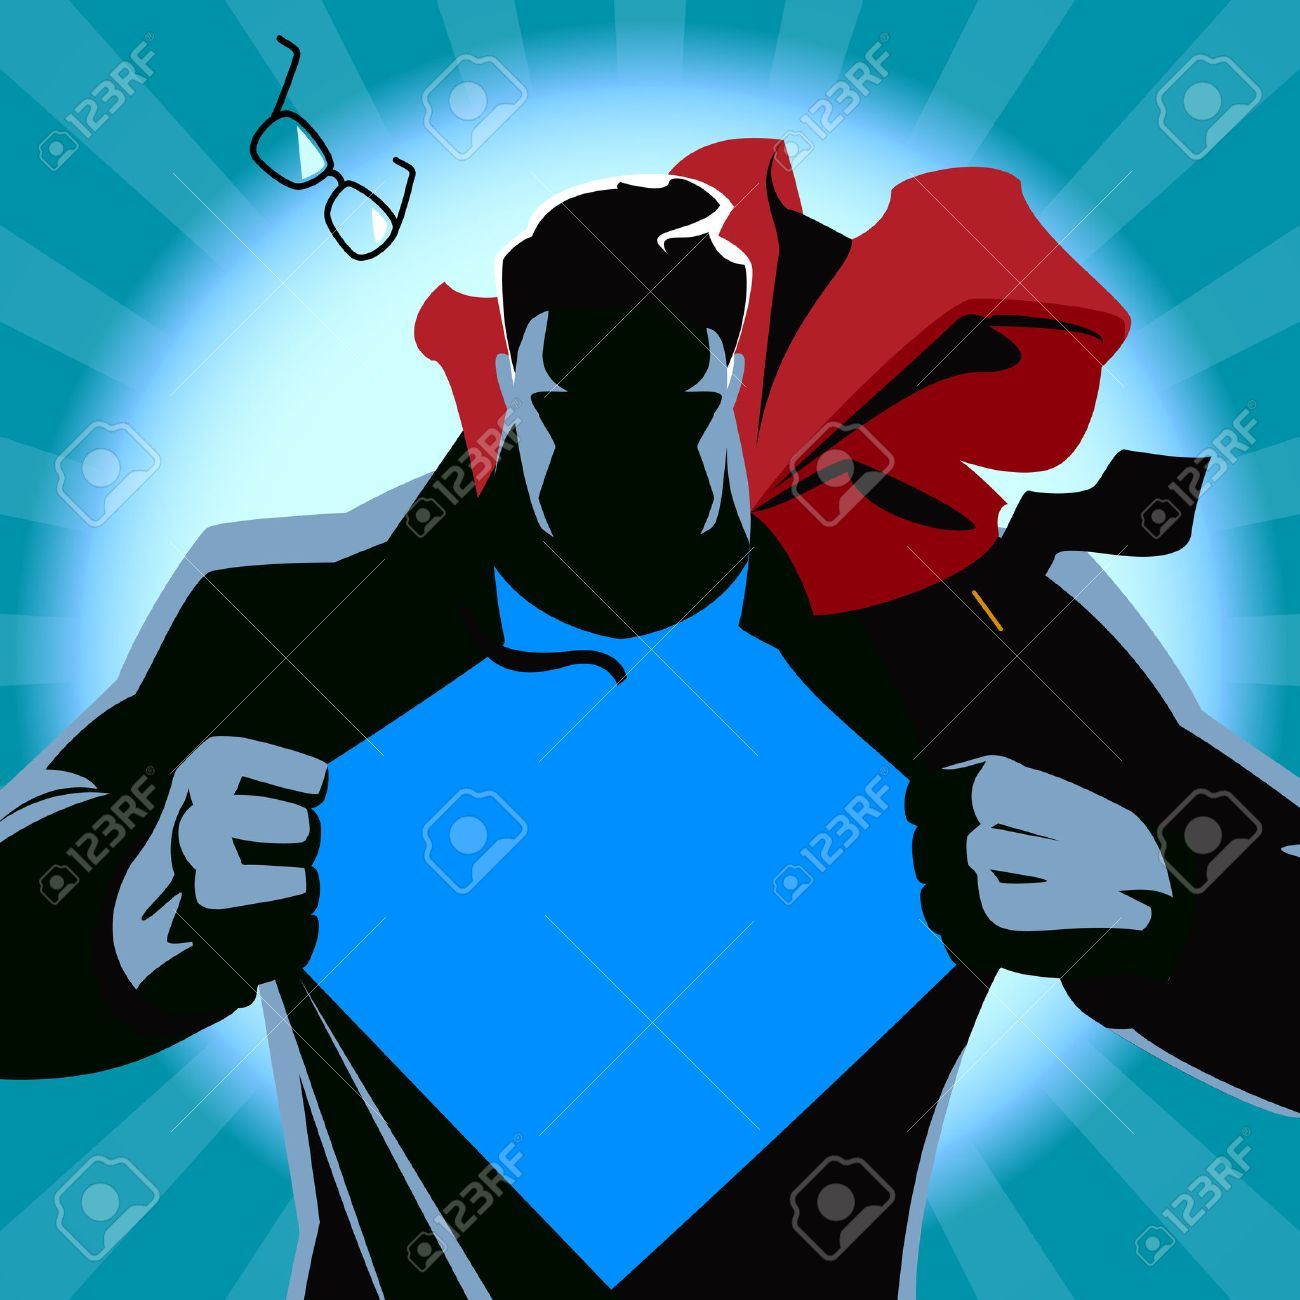 Superman tearing his shirt. Vector illustration. Silhouette - 41360714